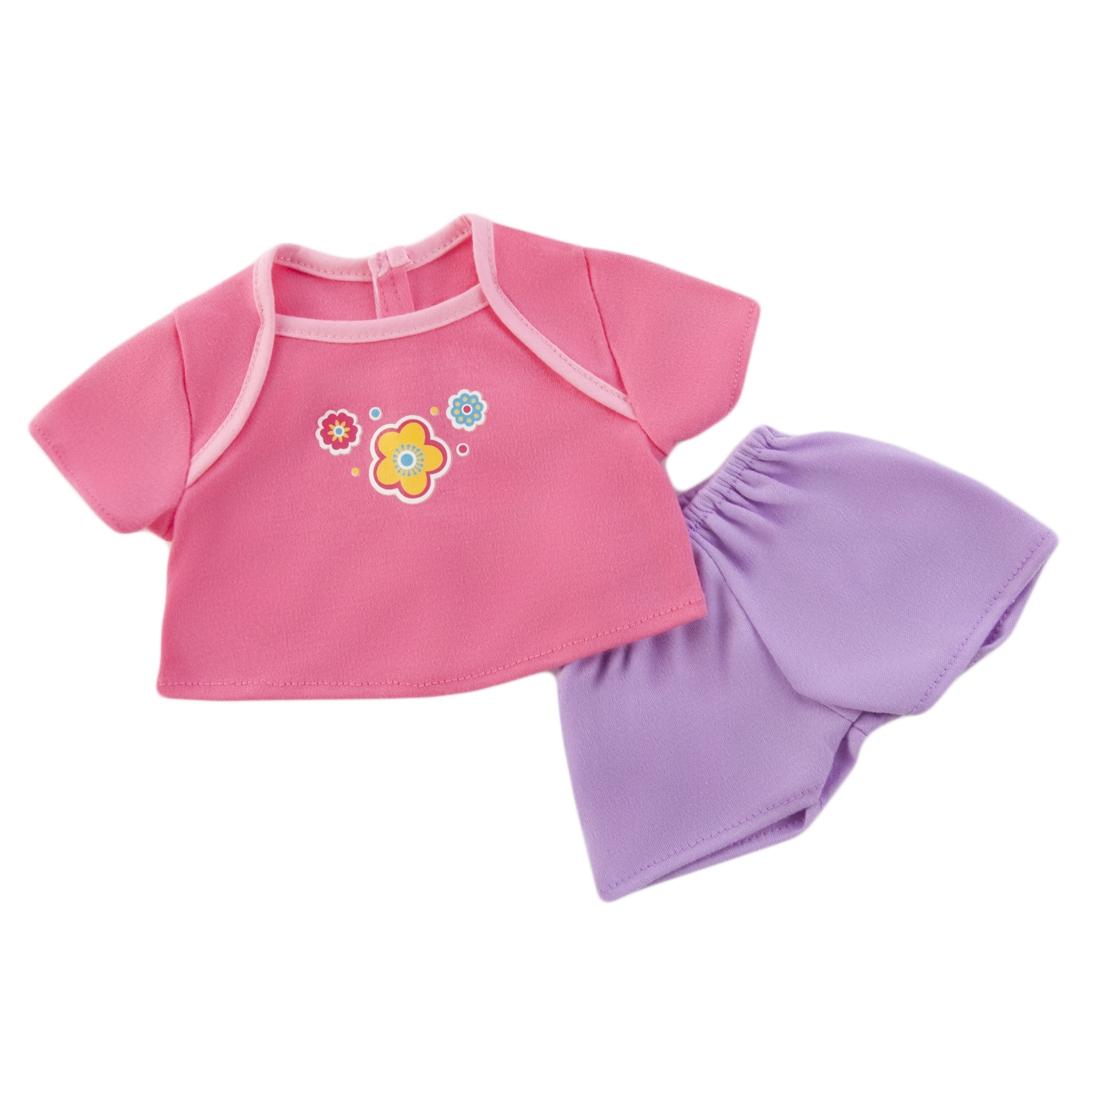 Одежда для кукол Mary Poppins Футболочка и штанишки для куклы Mary Poppins игрушечная бытовая техника mary poppins умный дом